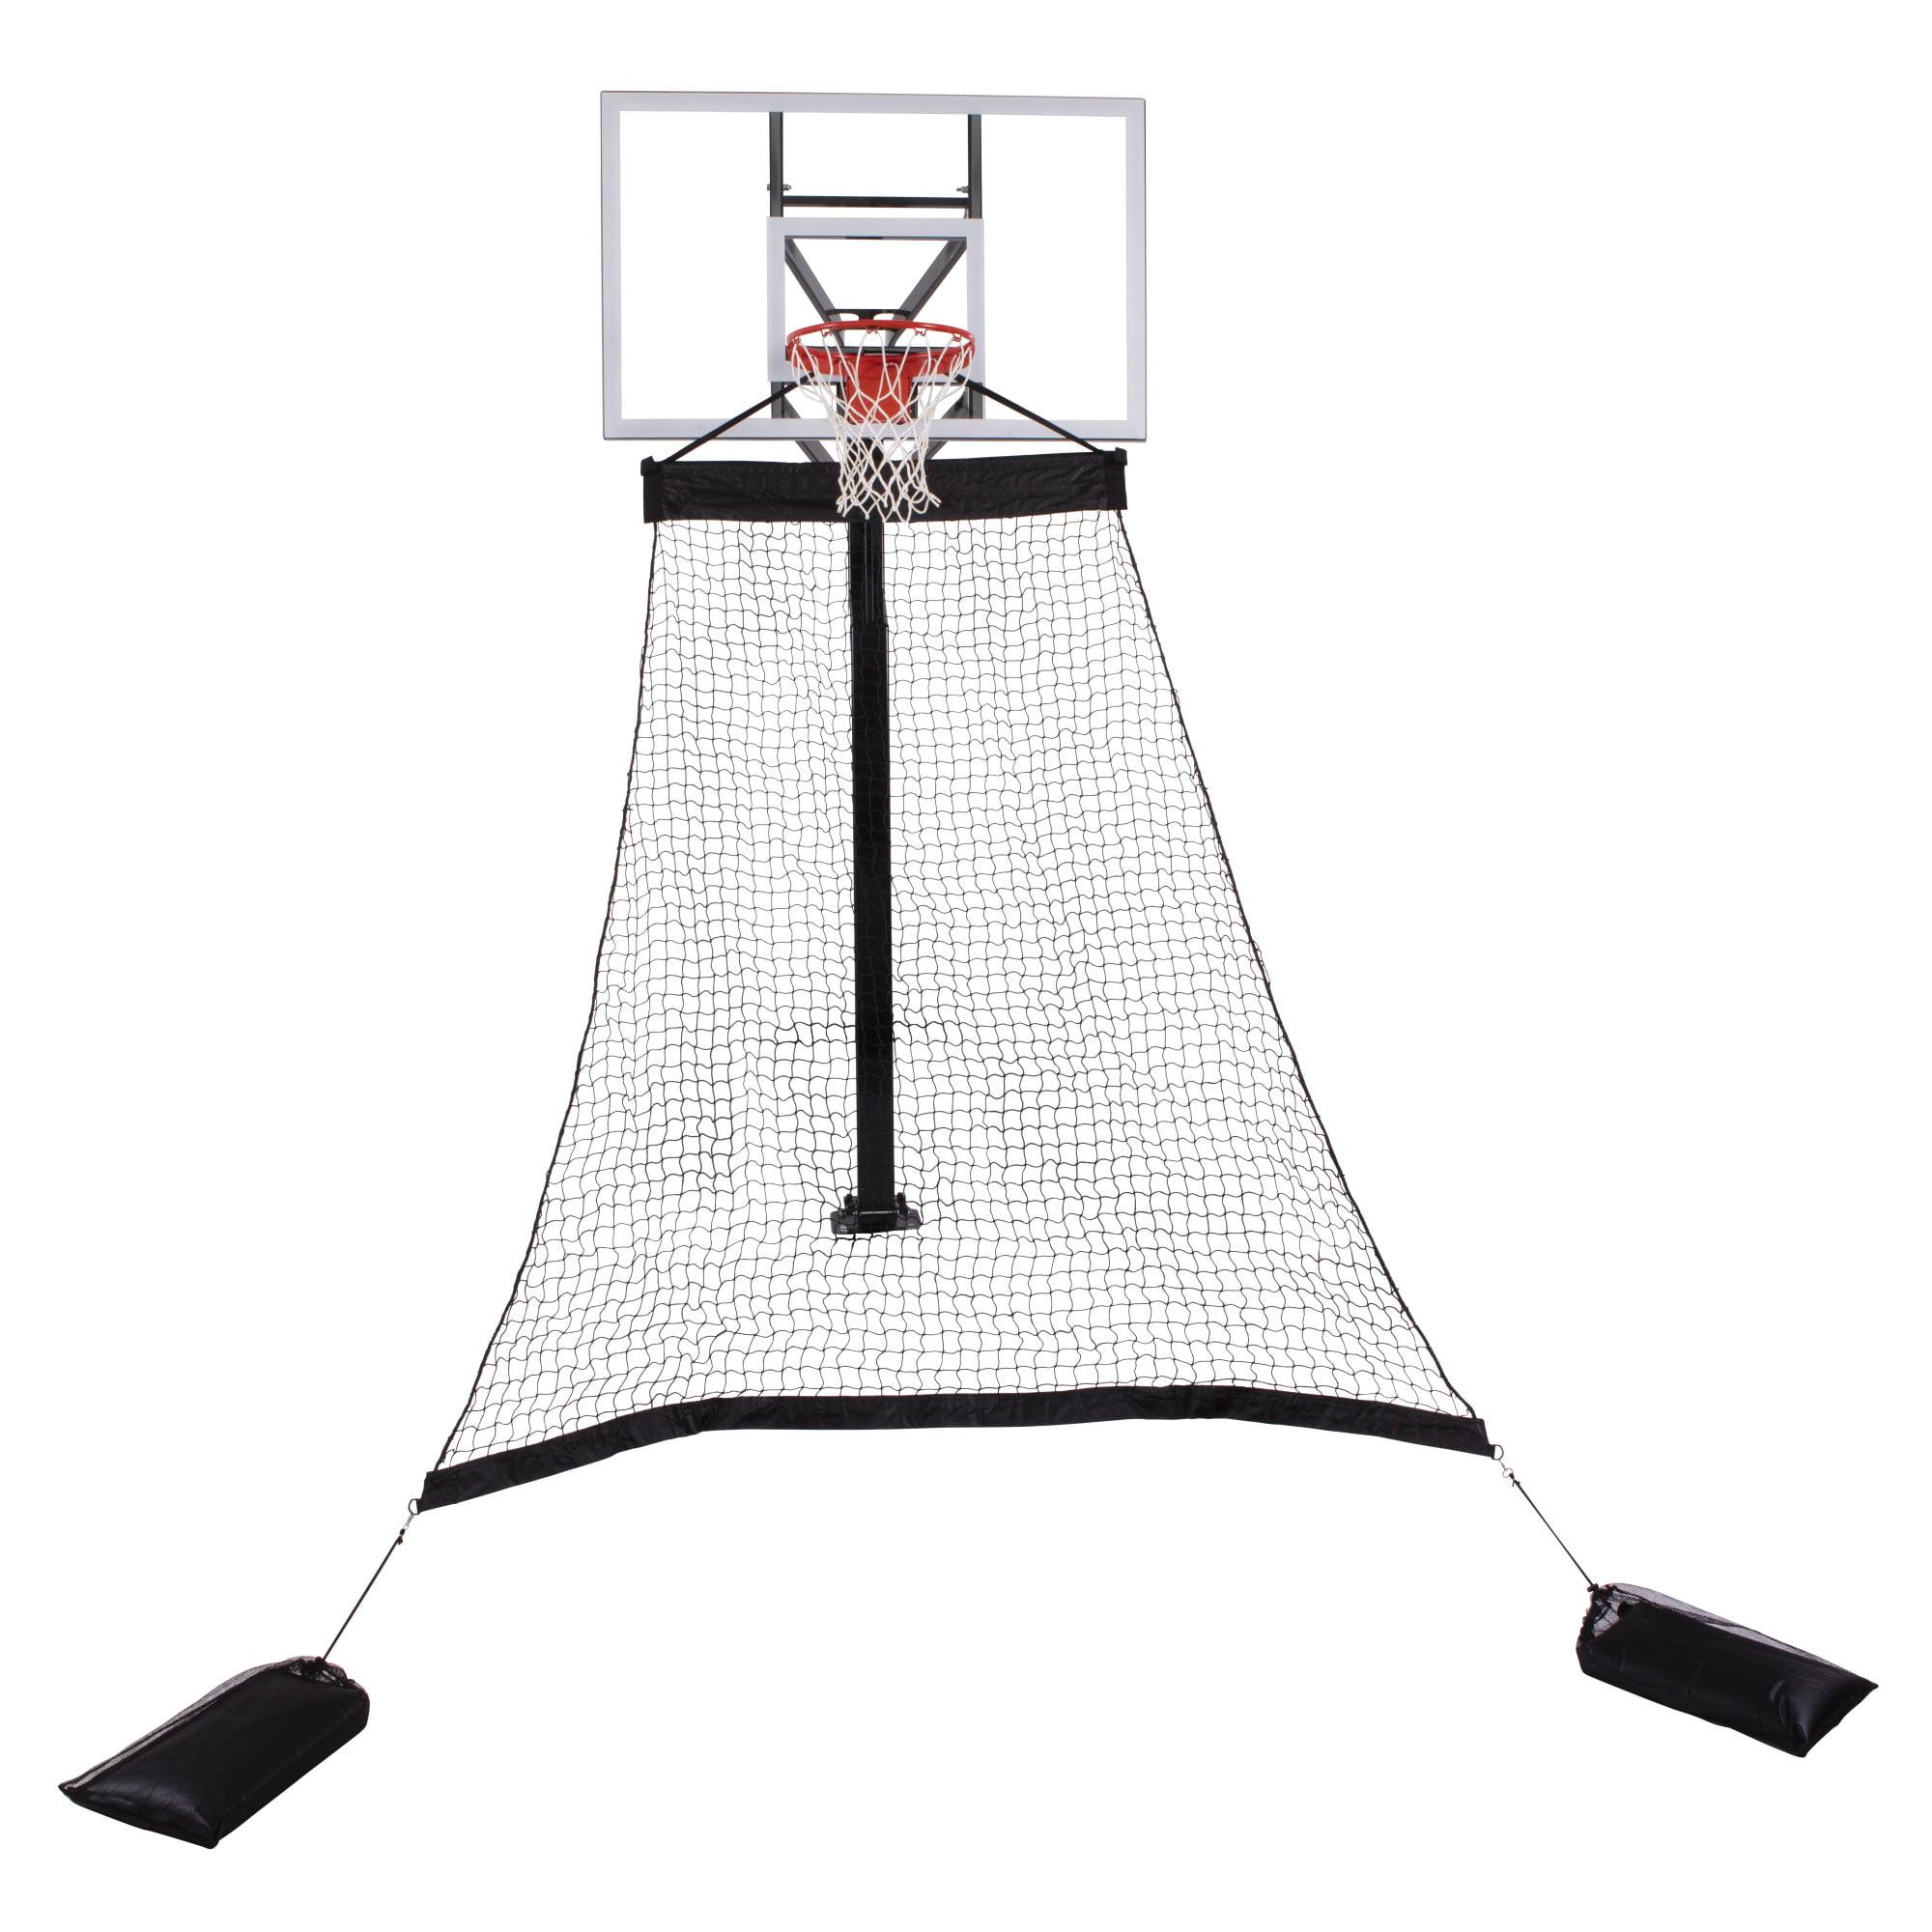 Goaliath Basketball Return System